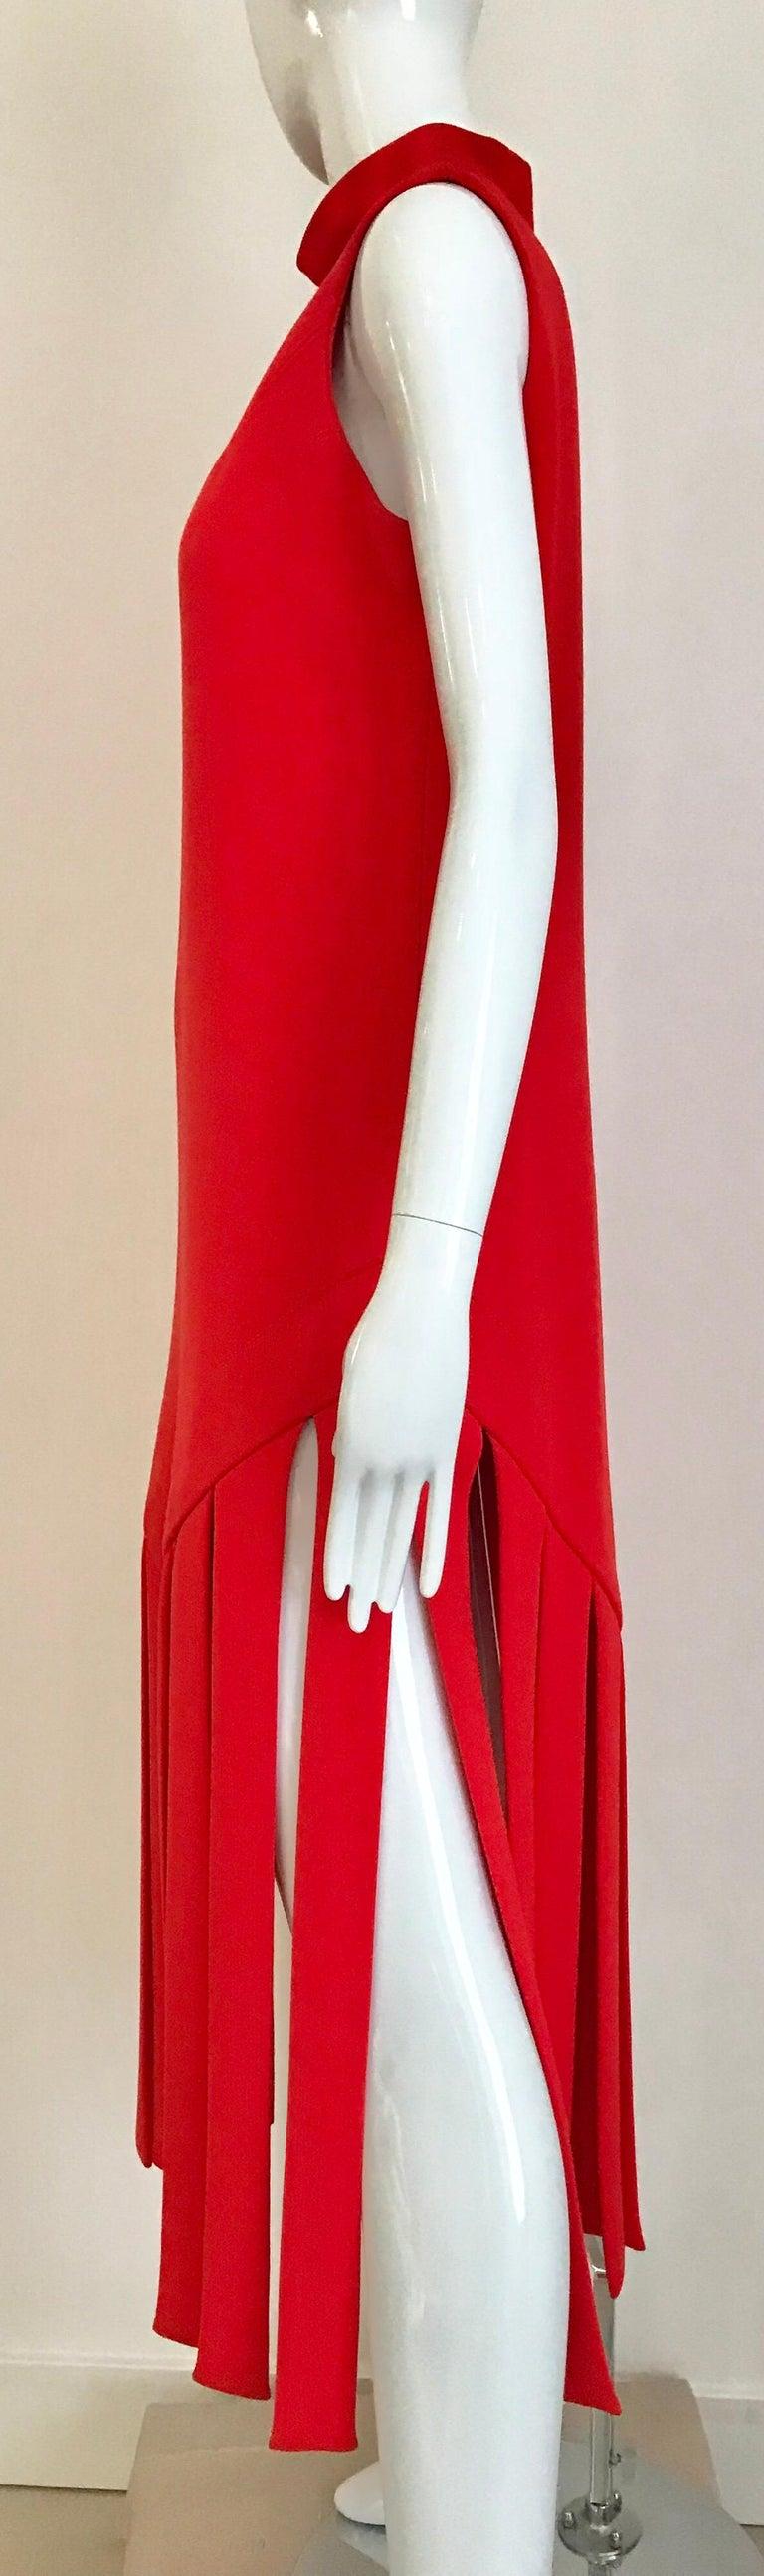 Vintage Pierre Cardin Sleeveless Crepe Dress  For Sale 3